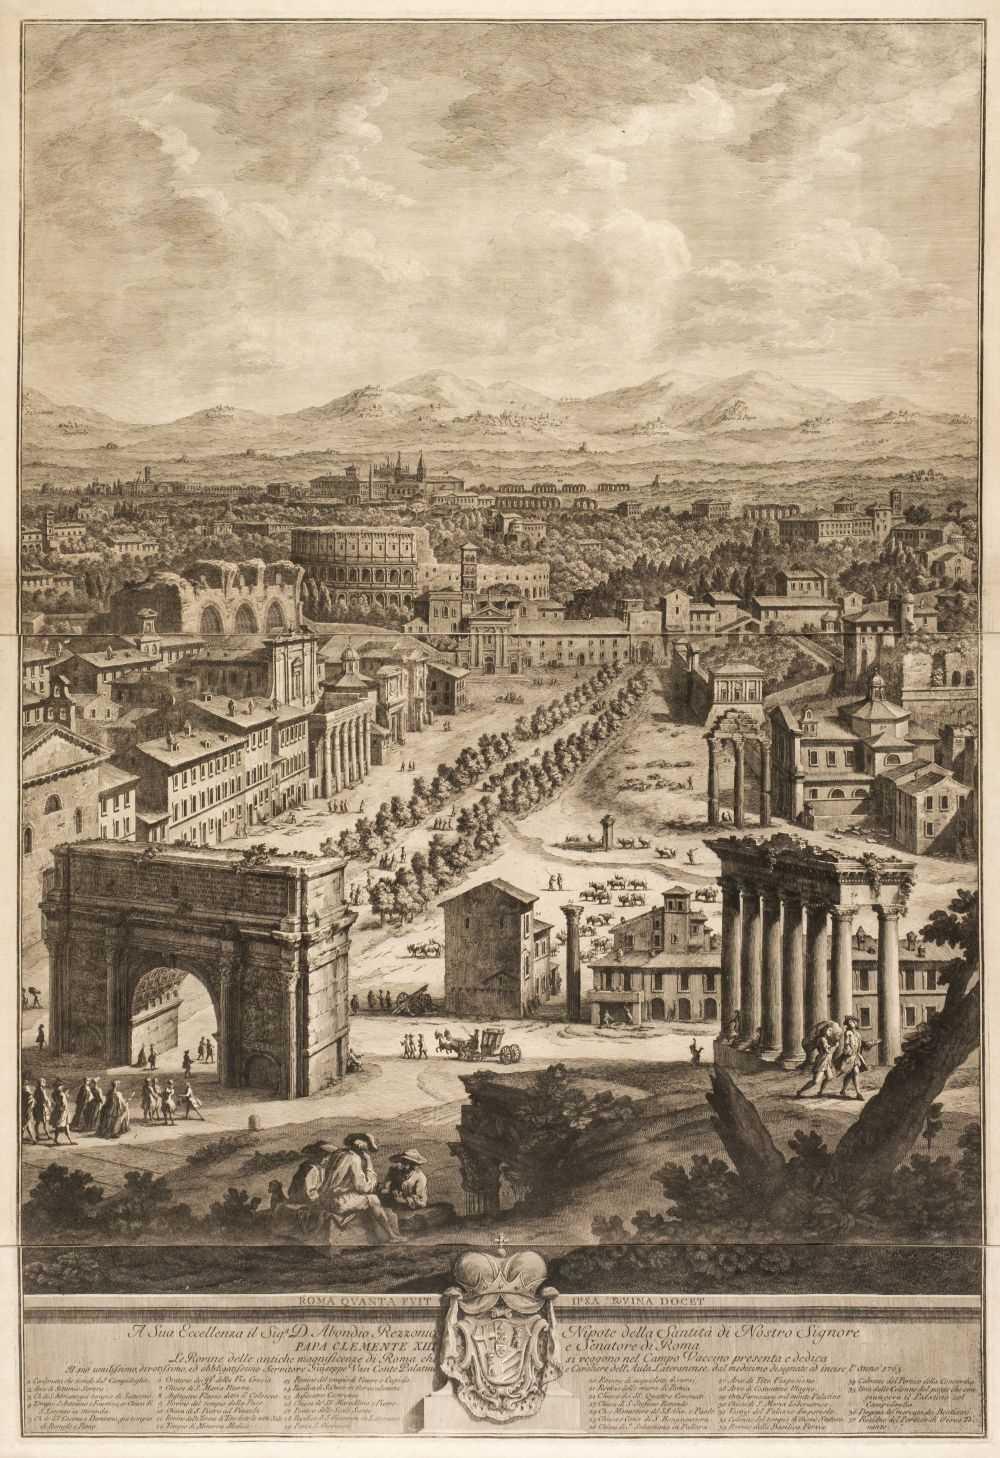 Lot 316 - Vasi (Giuseppe, 1710-1782). Le Rovine..., 1765